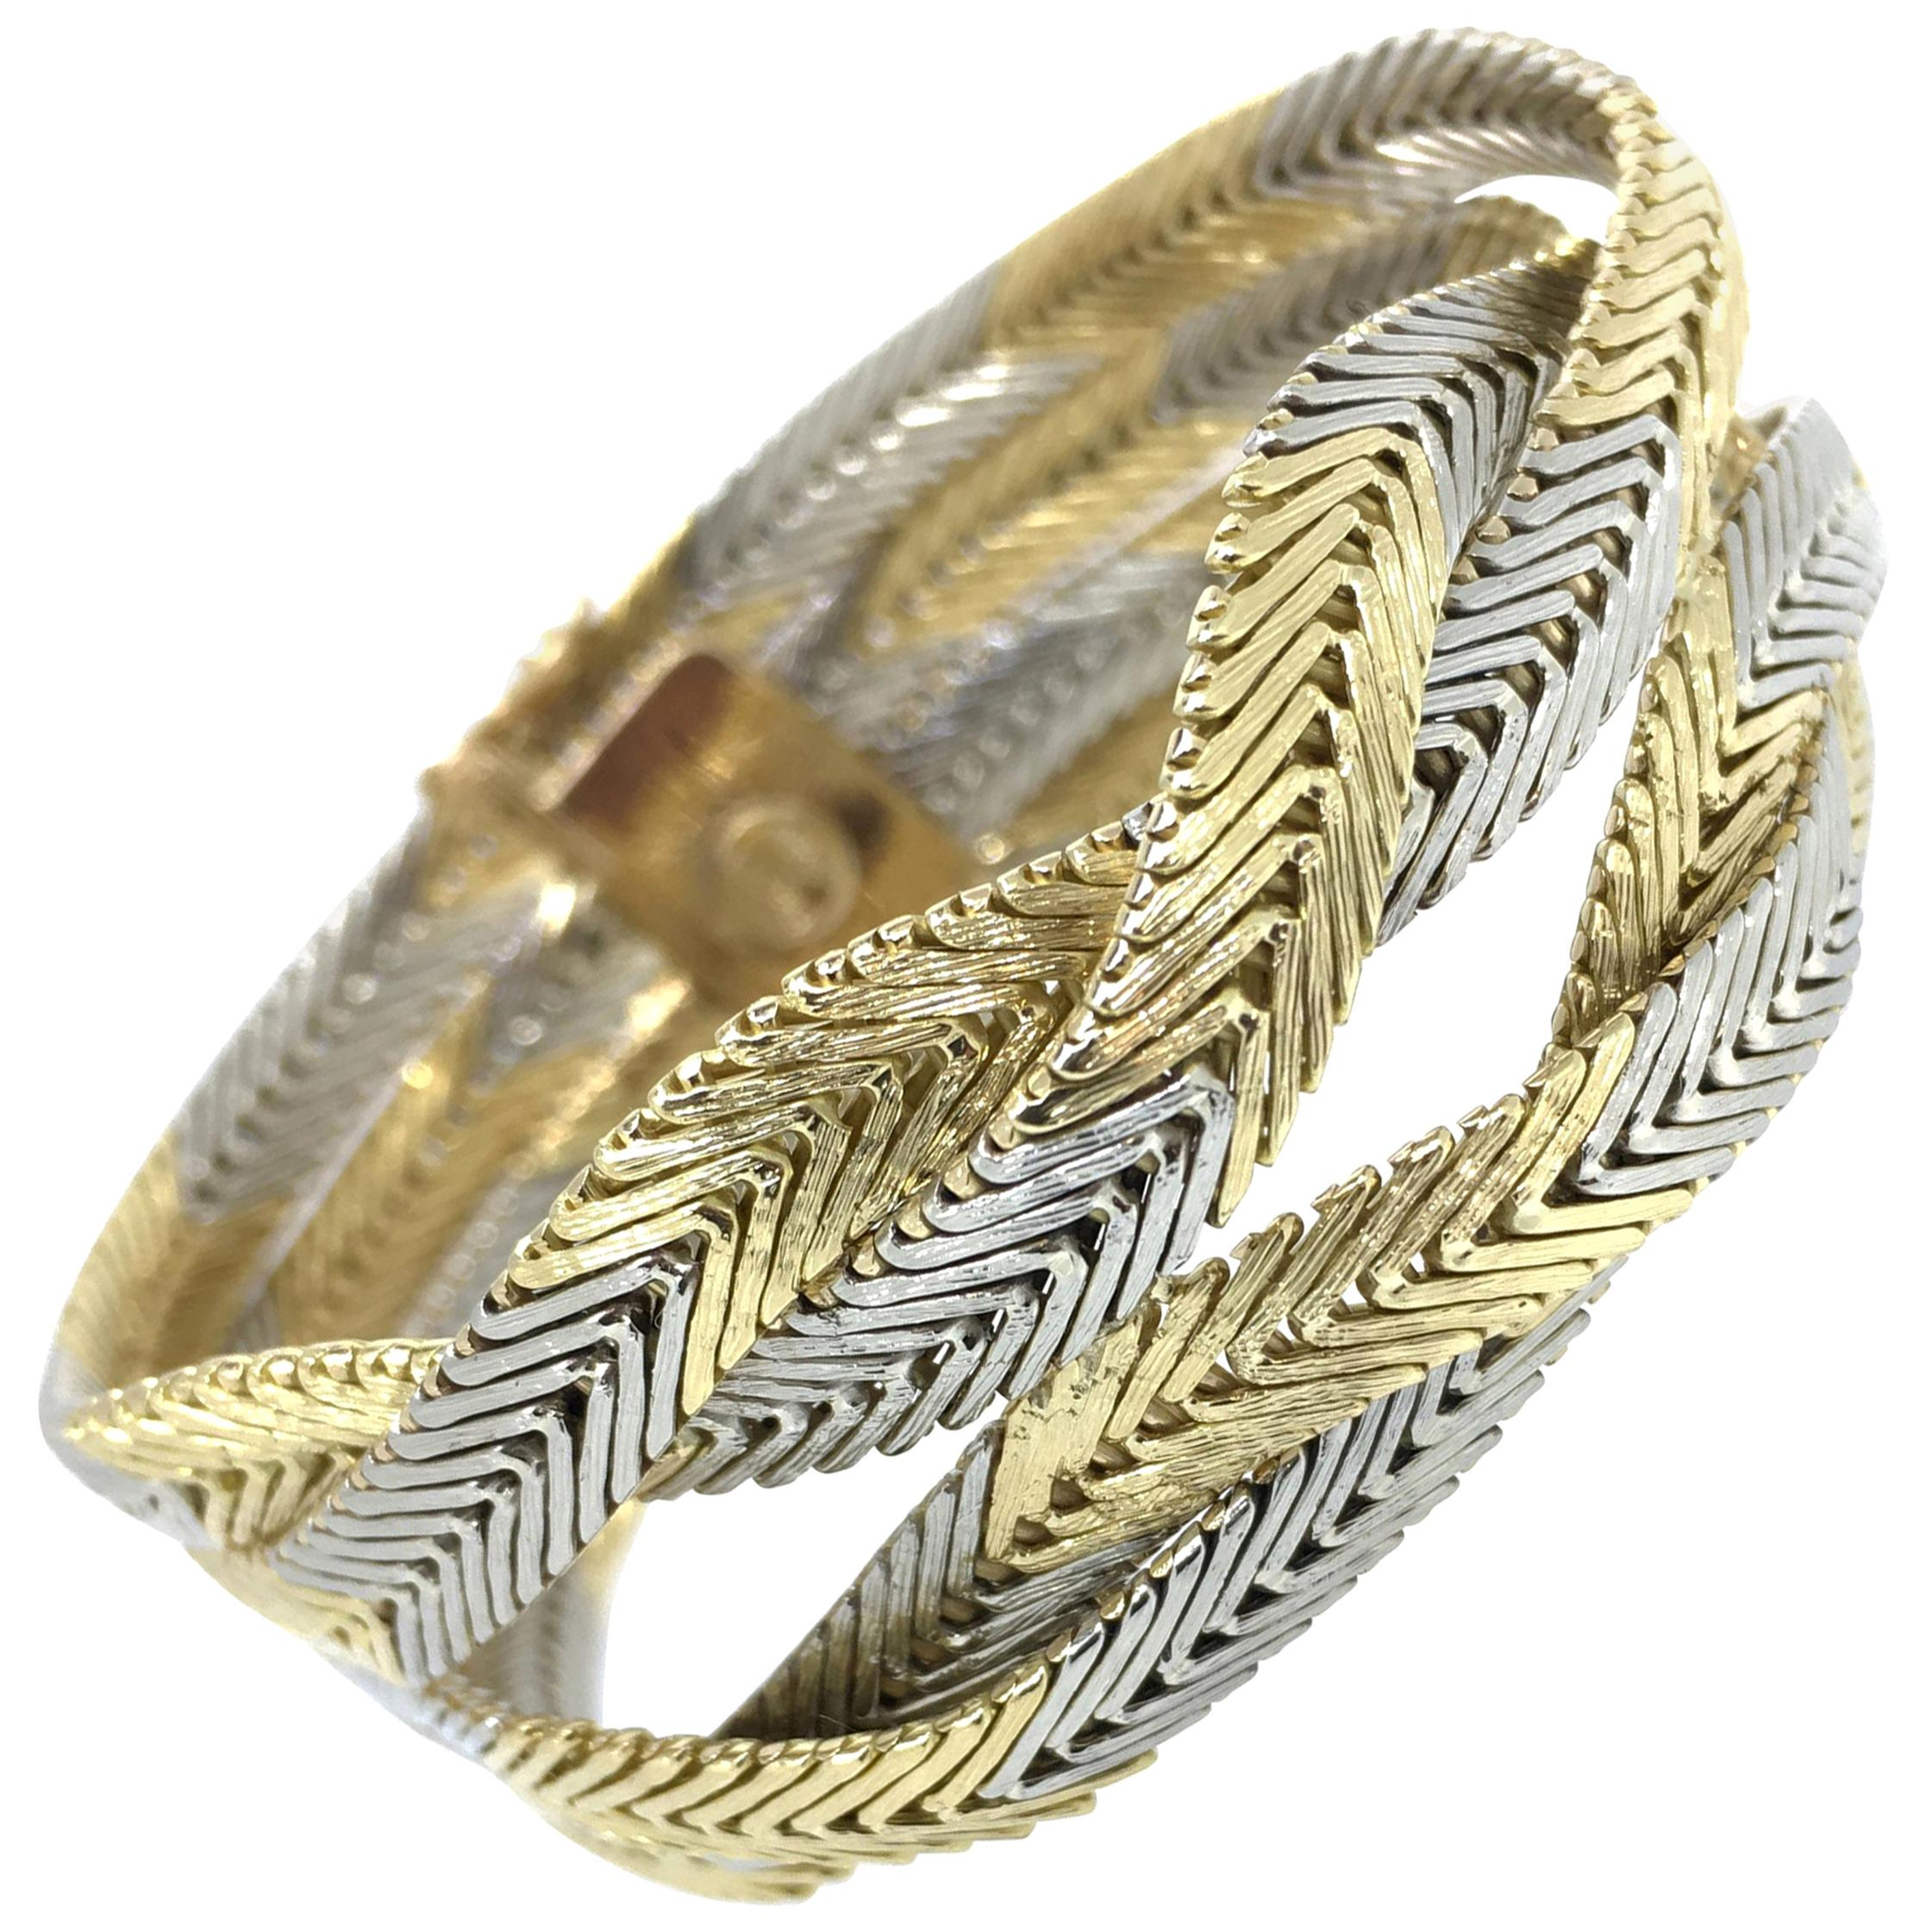 Bracelet, 18 Carat Gold, Italian Design, 1970